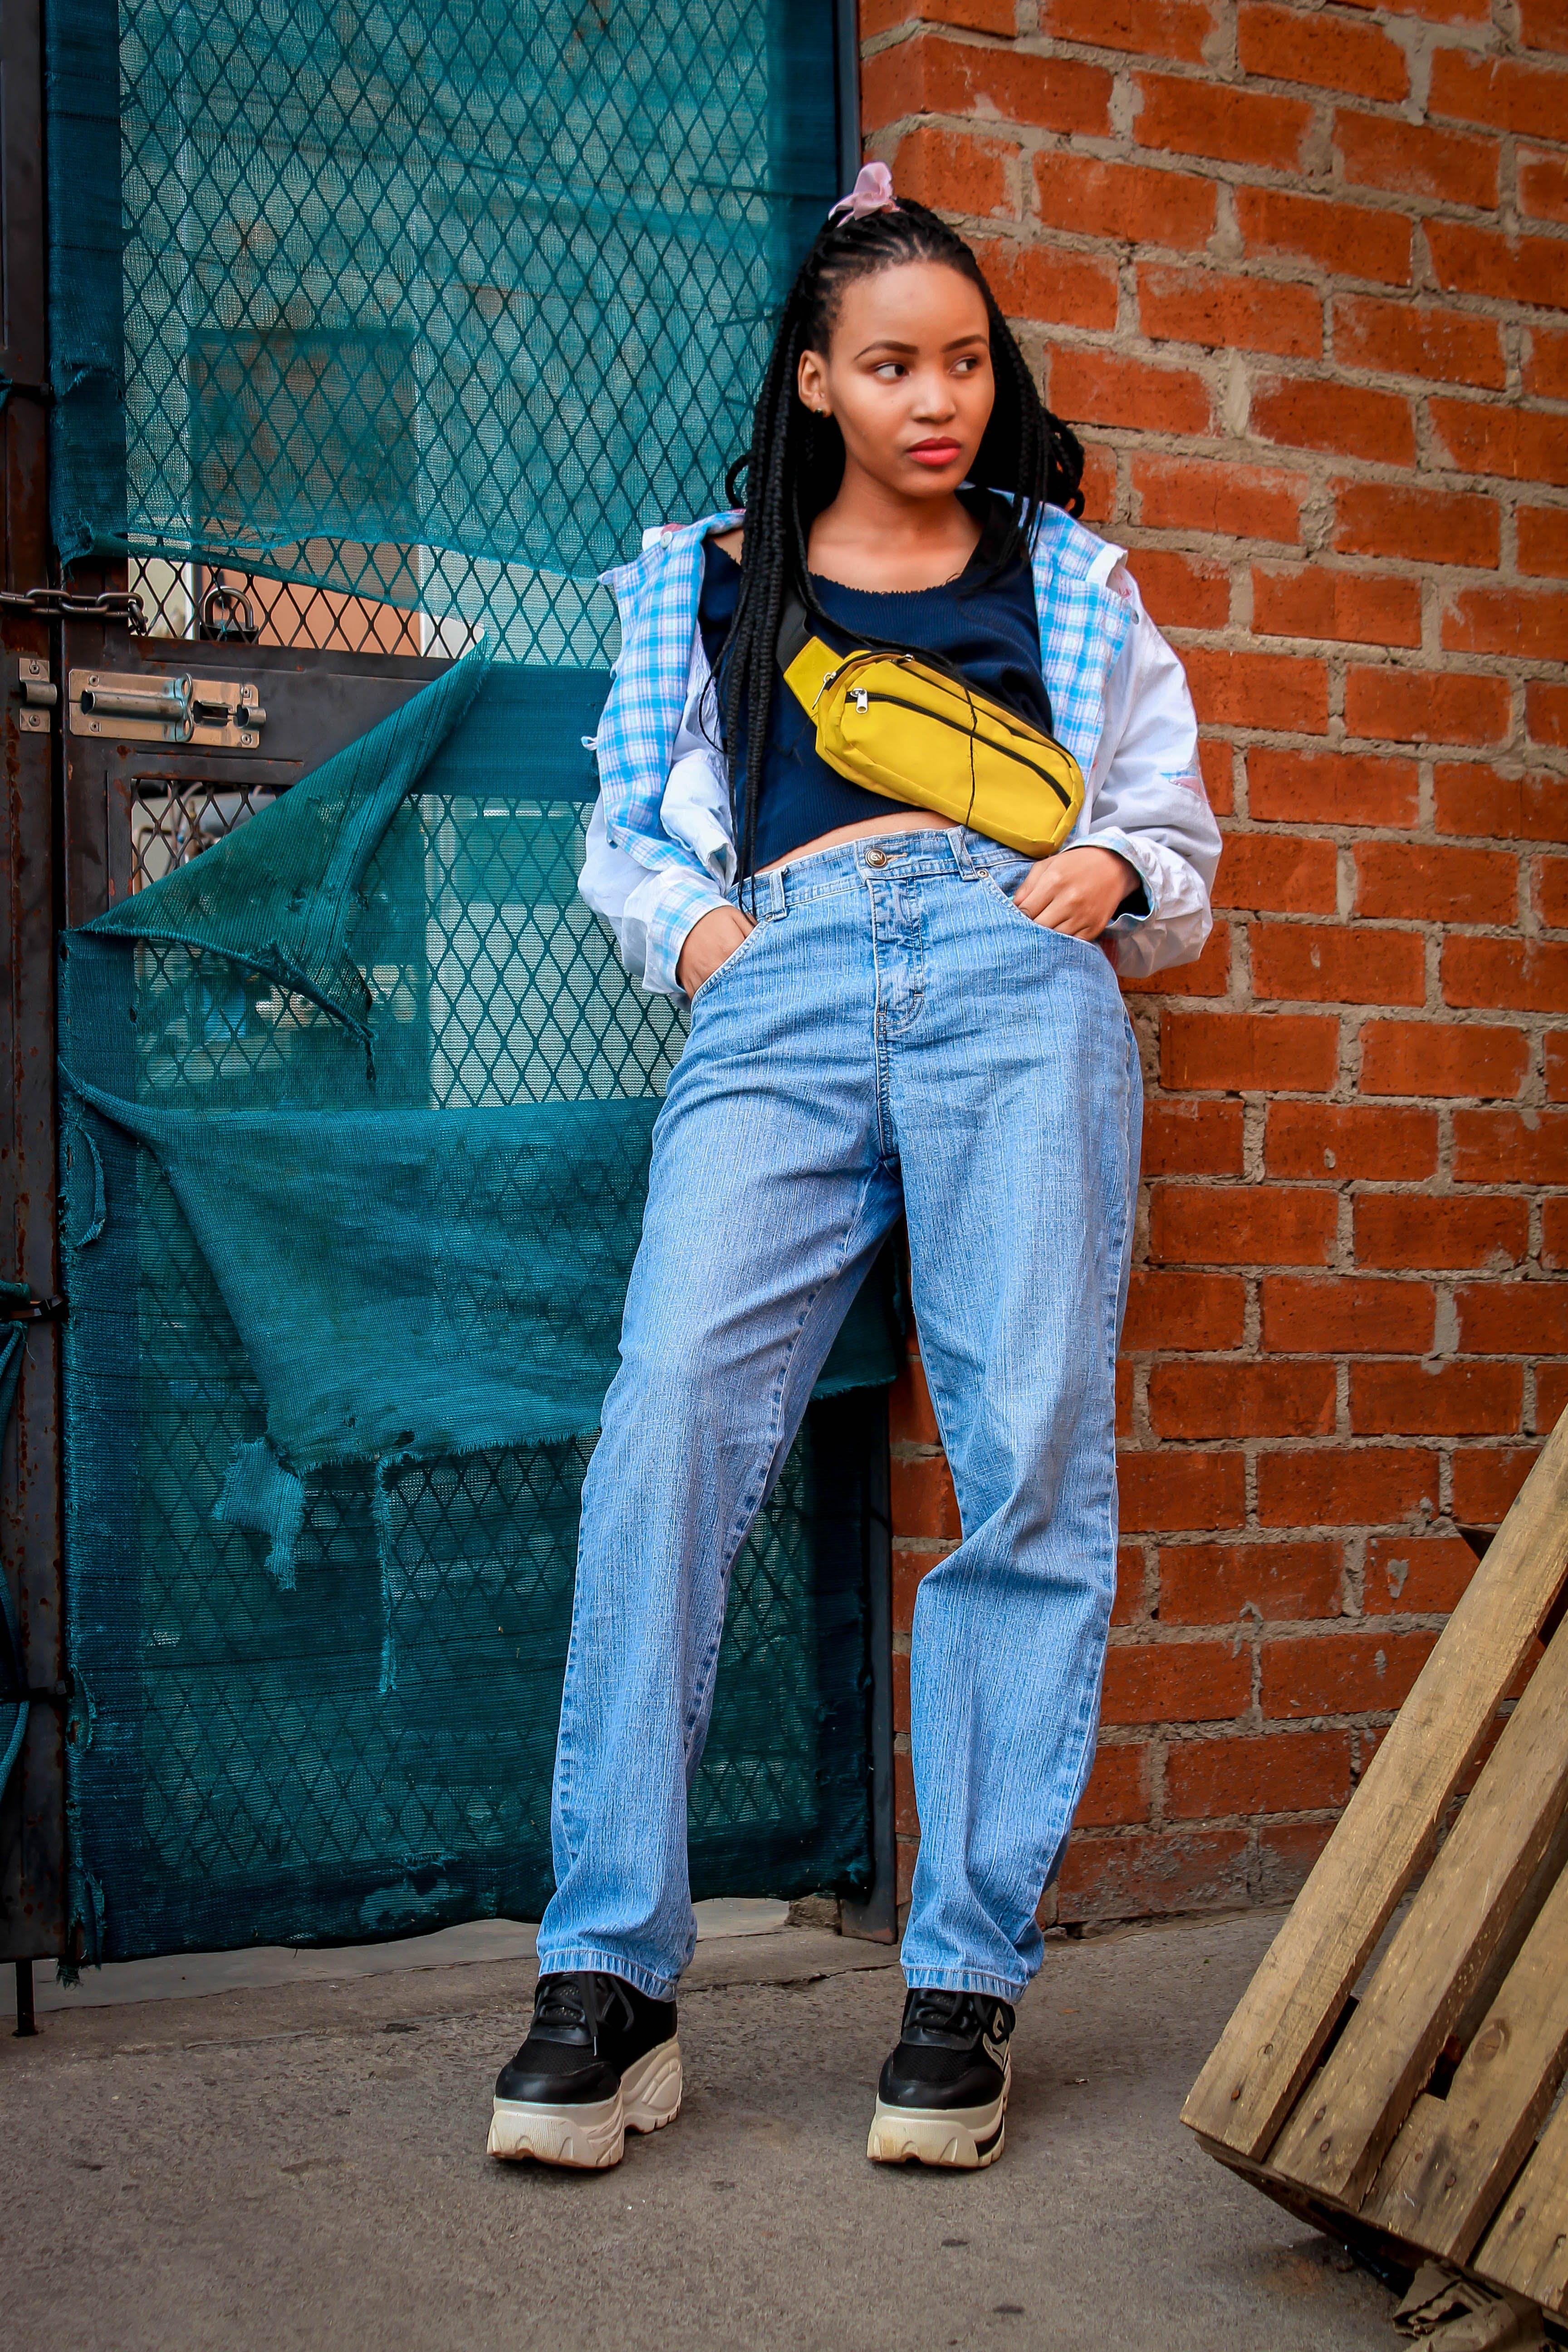 Free stock photo of Woman wearing classic jean